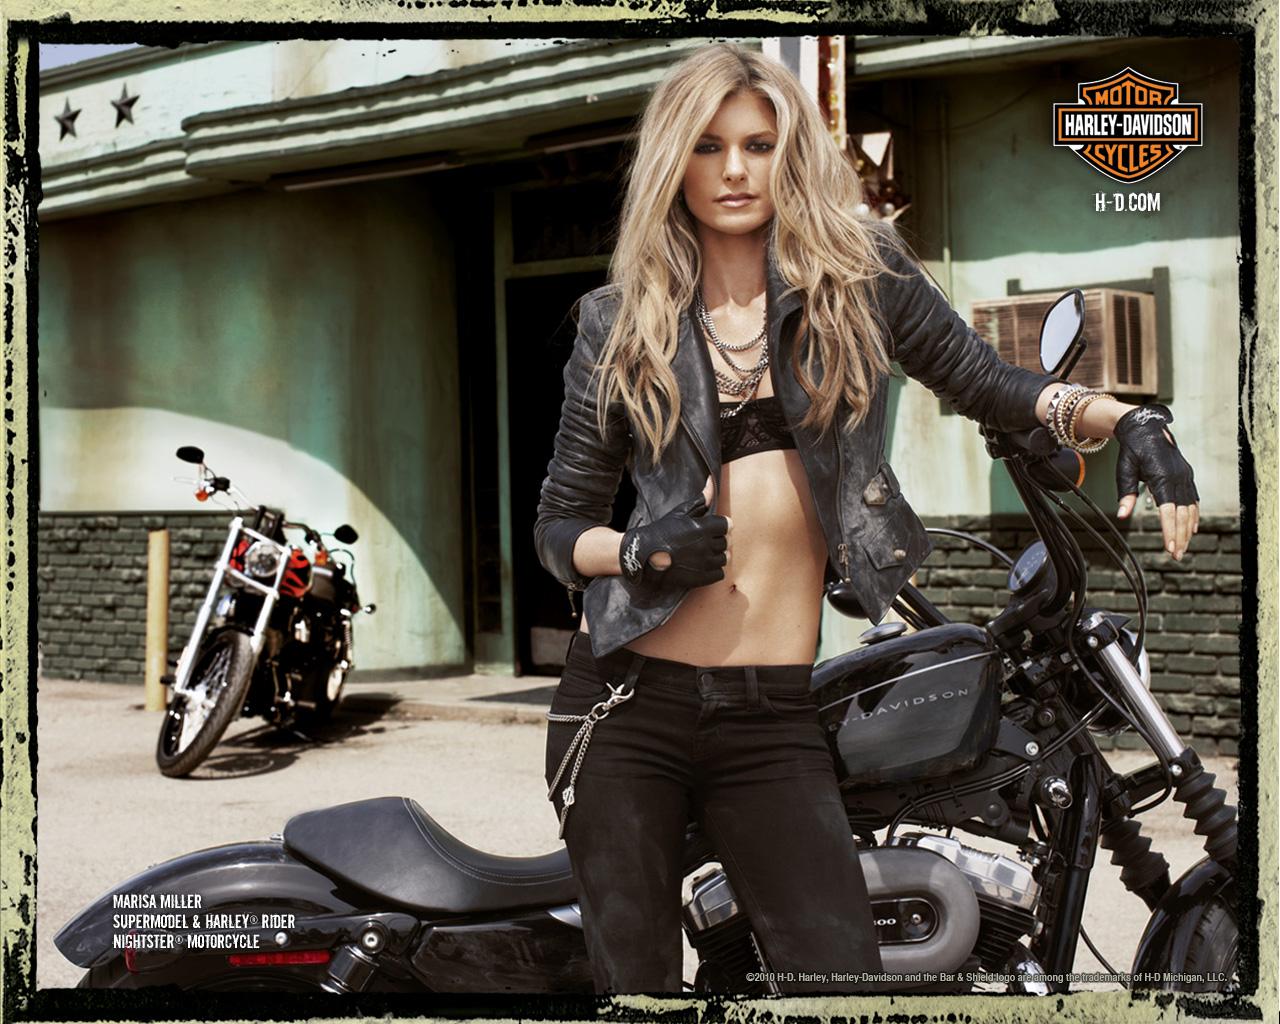 Harley Davidson Pink Bike Free Hd Wallpaper Motorcycle Models Inspiration